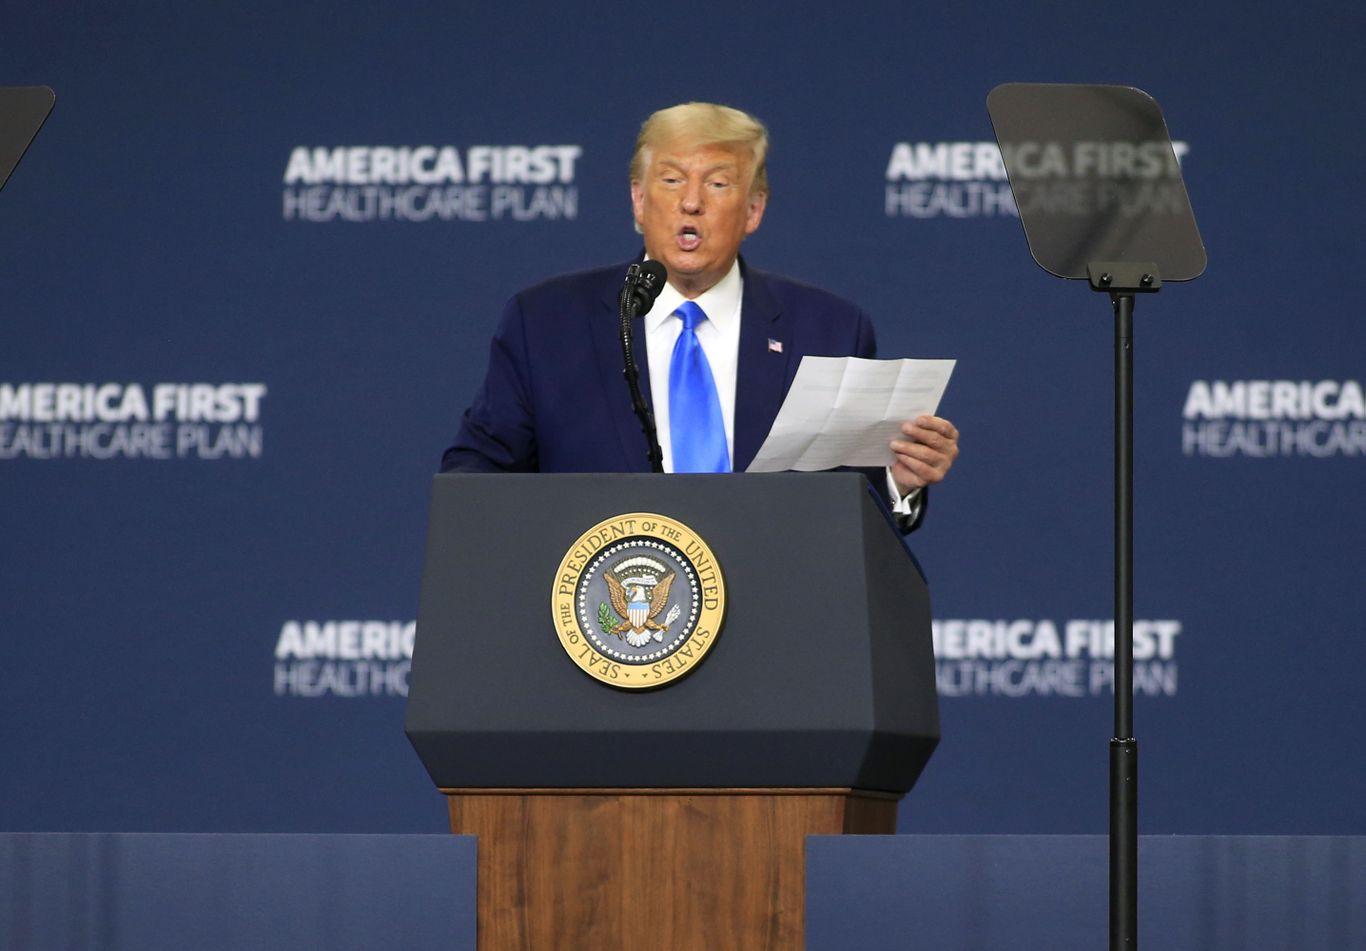 Trump unveils health care vision, but offers little detail